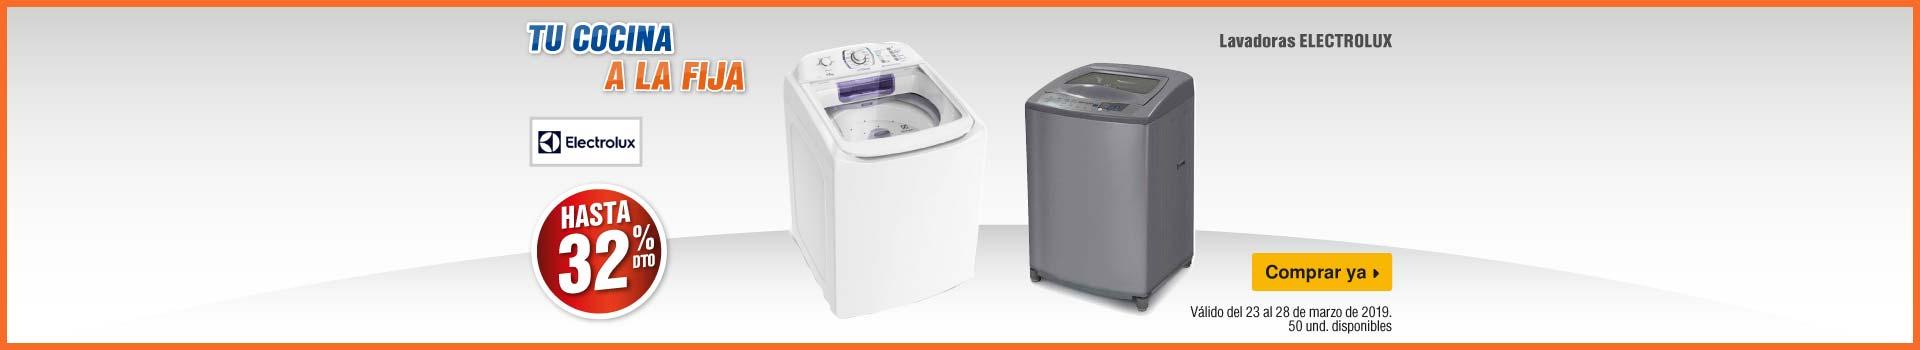 AK-KT-mayores-3-ELECT-BCAT-lavadoras-ELECTROLUX-230319-extra